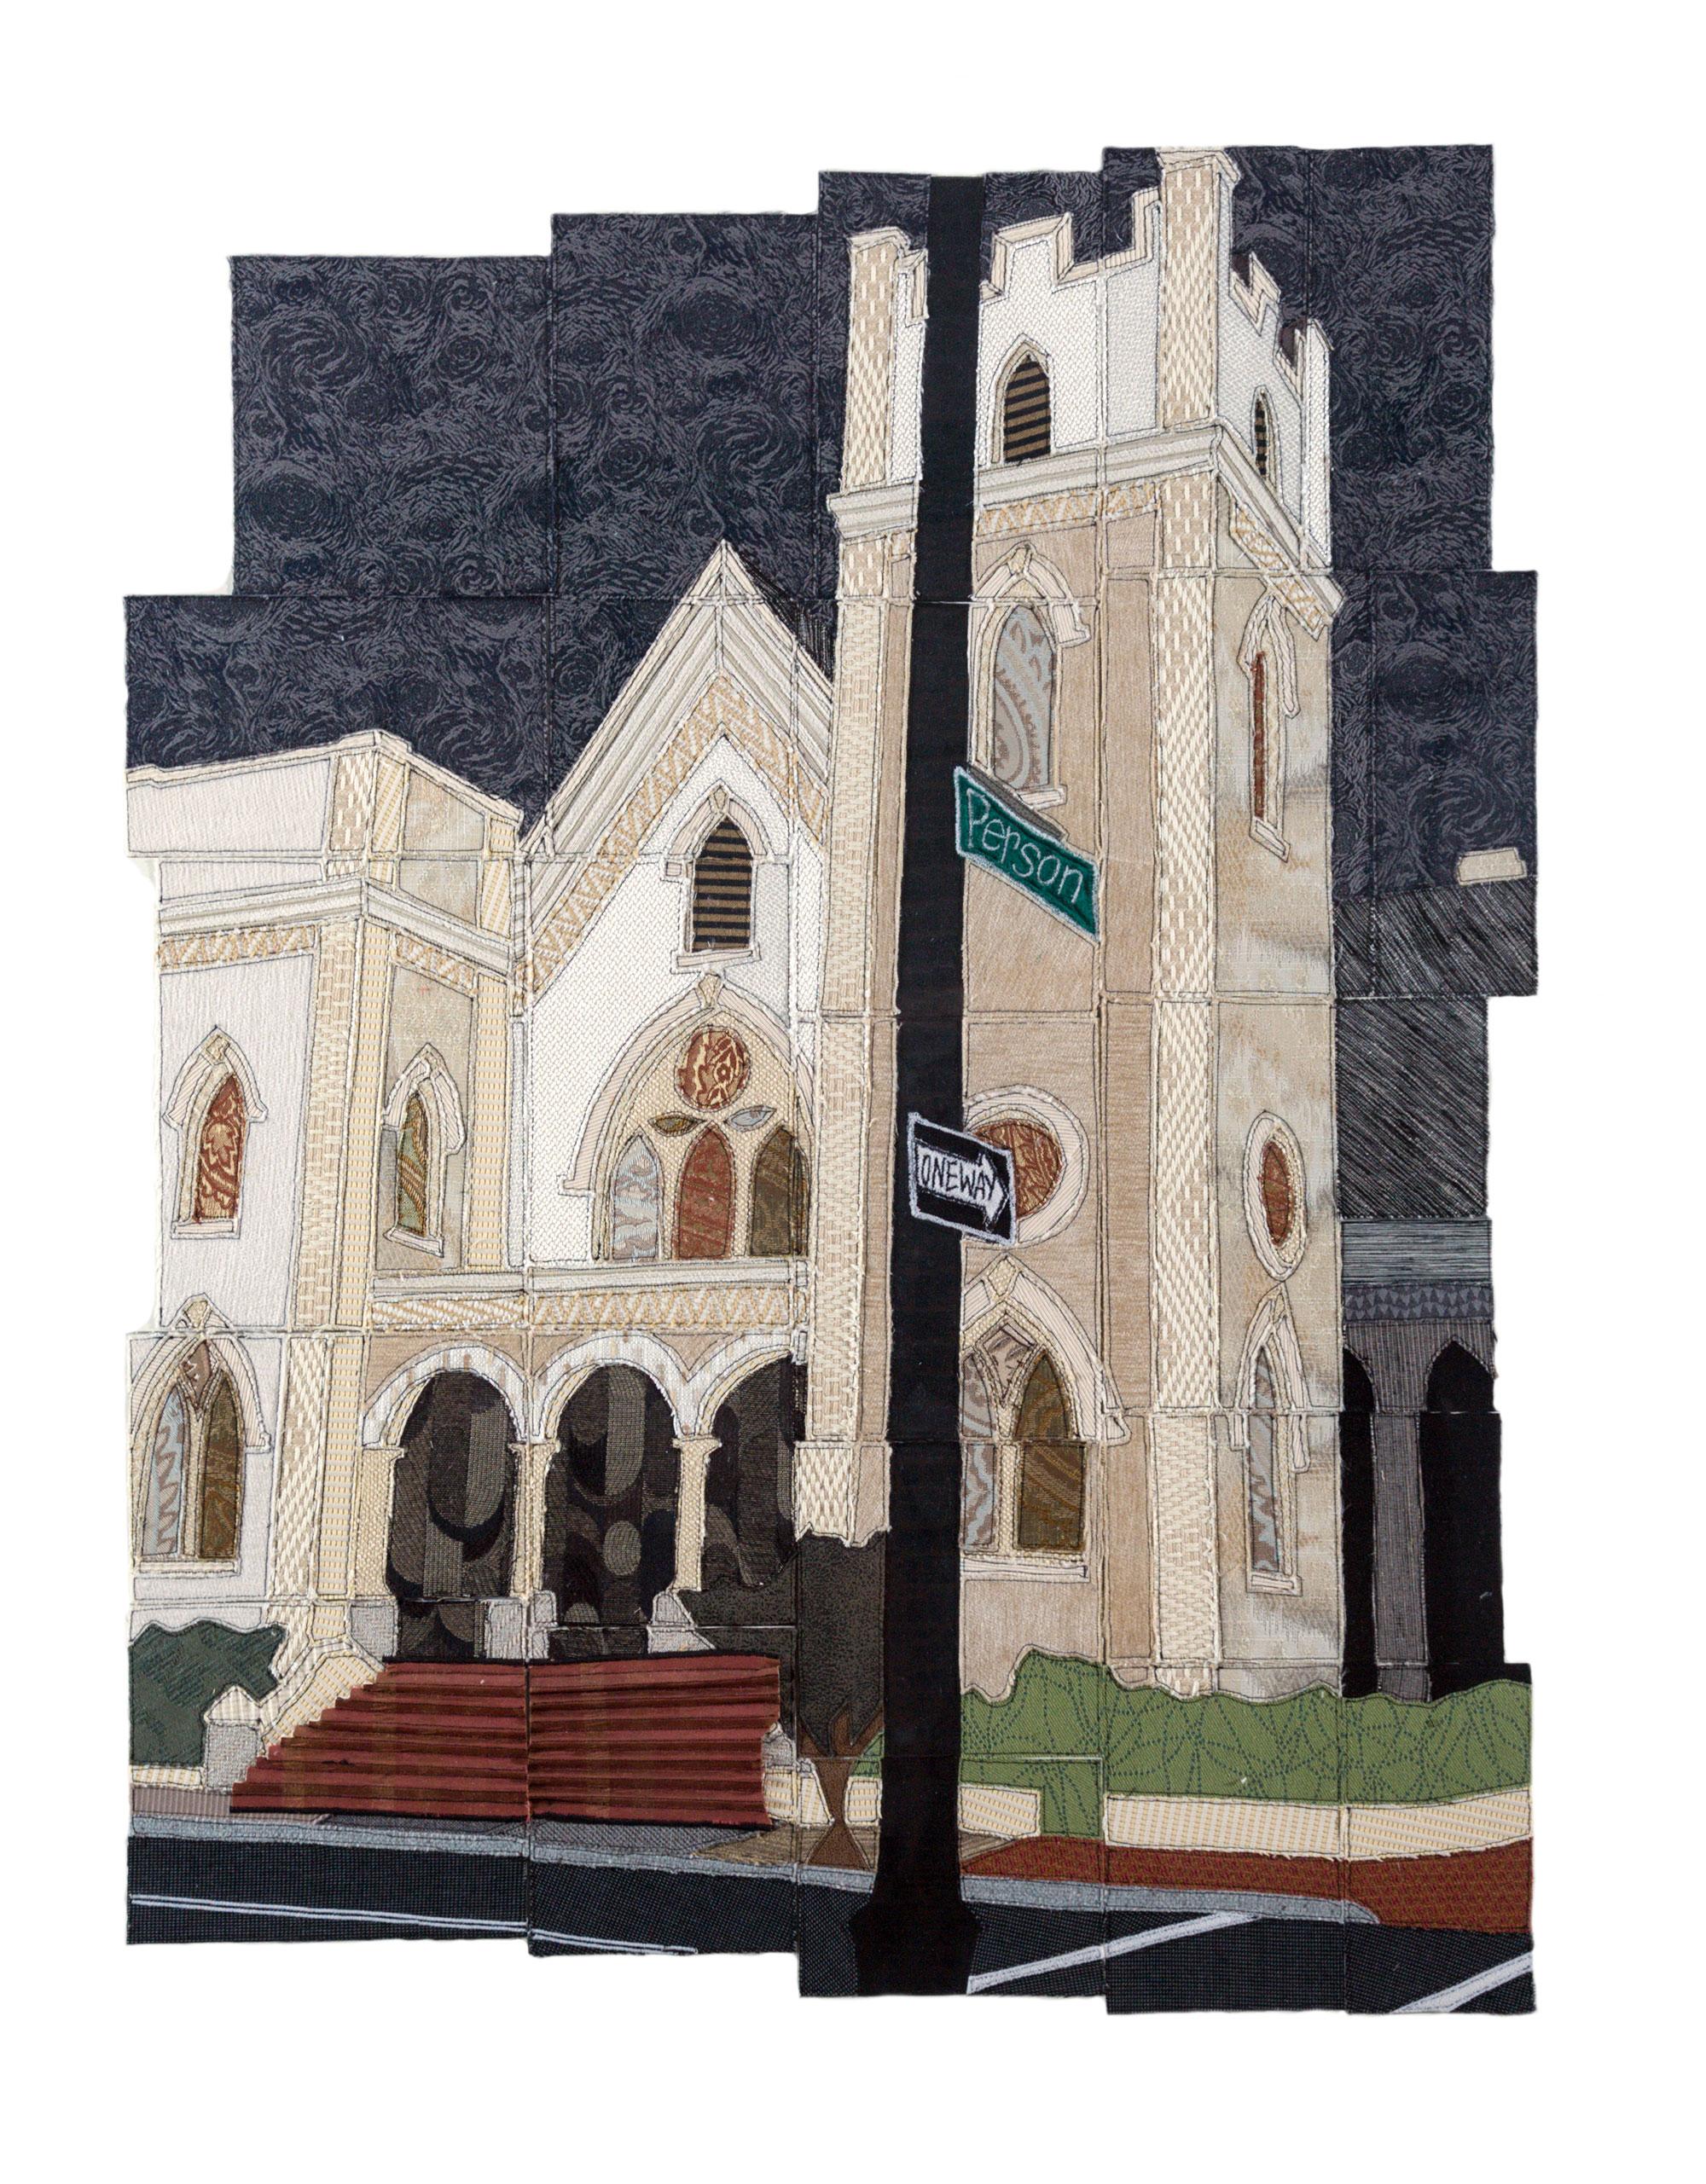 (Formerly) Tabernacle Baptist Church, Raleigh, NC, 2016